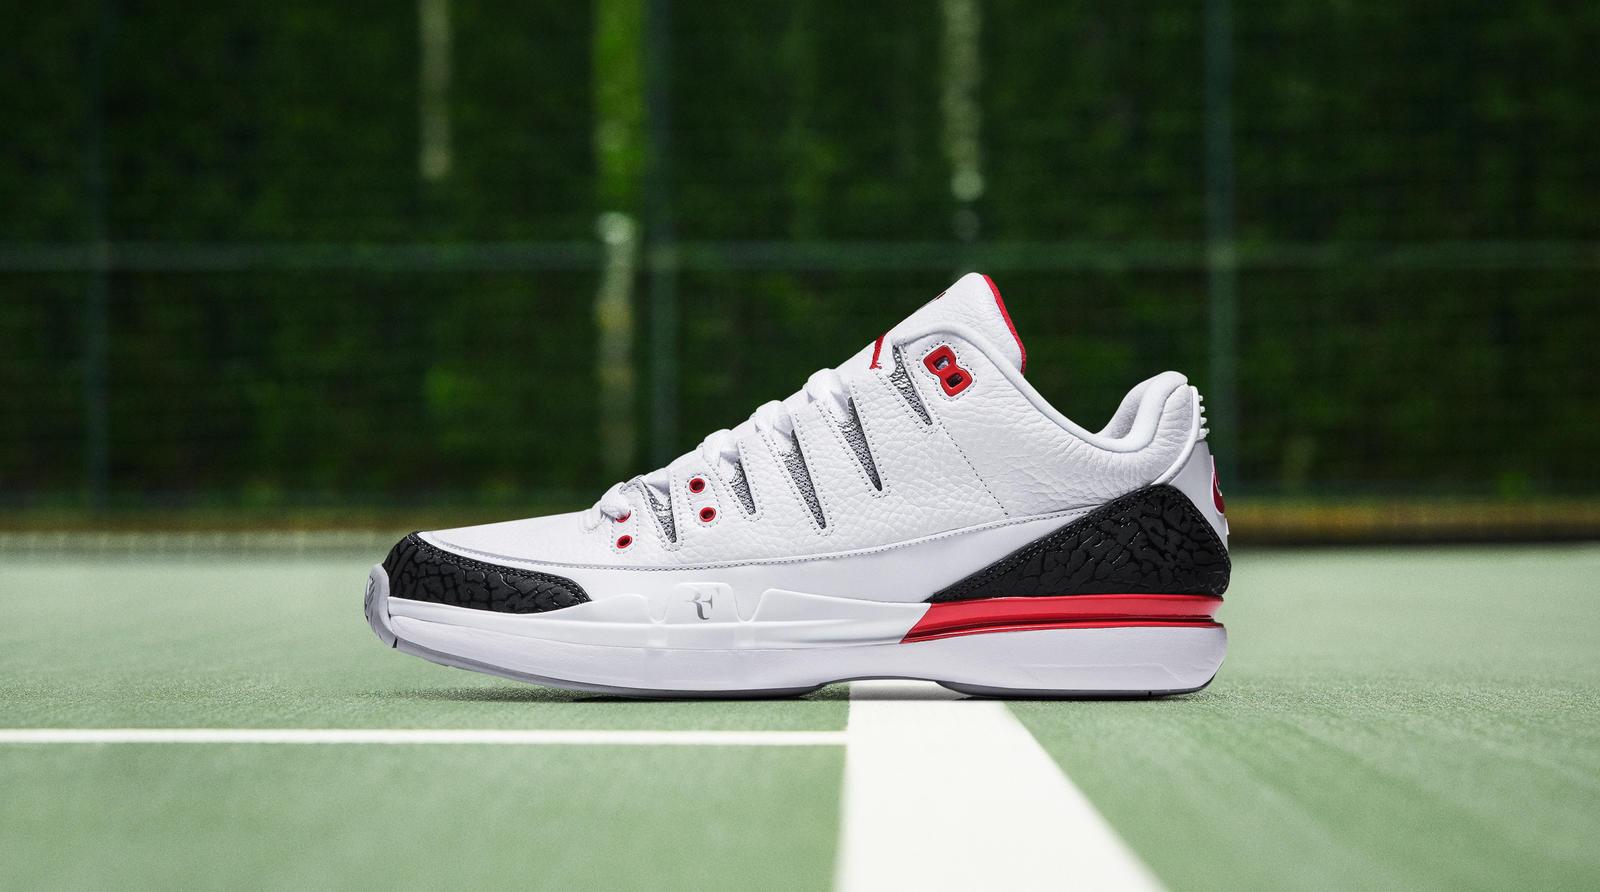 Nike-Zoom-Vapor-RF-Air-Jordan-3-Fire-Red